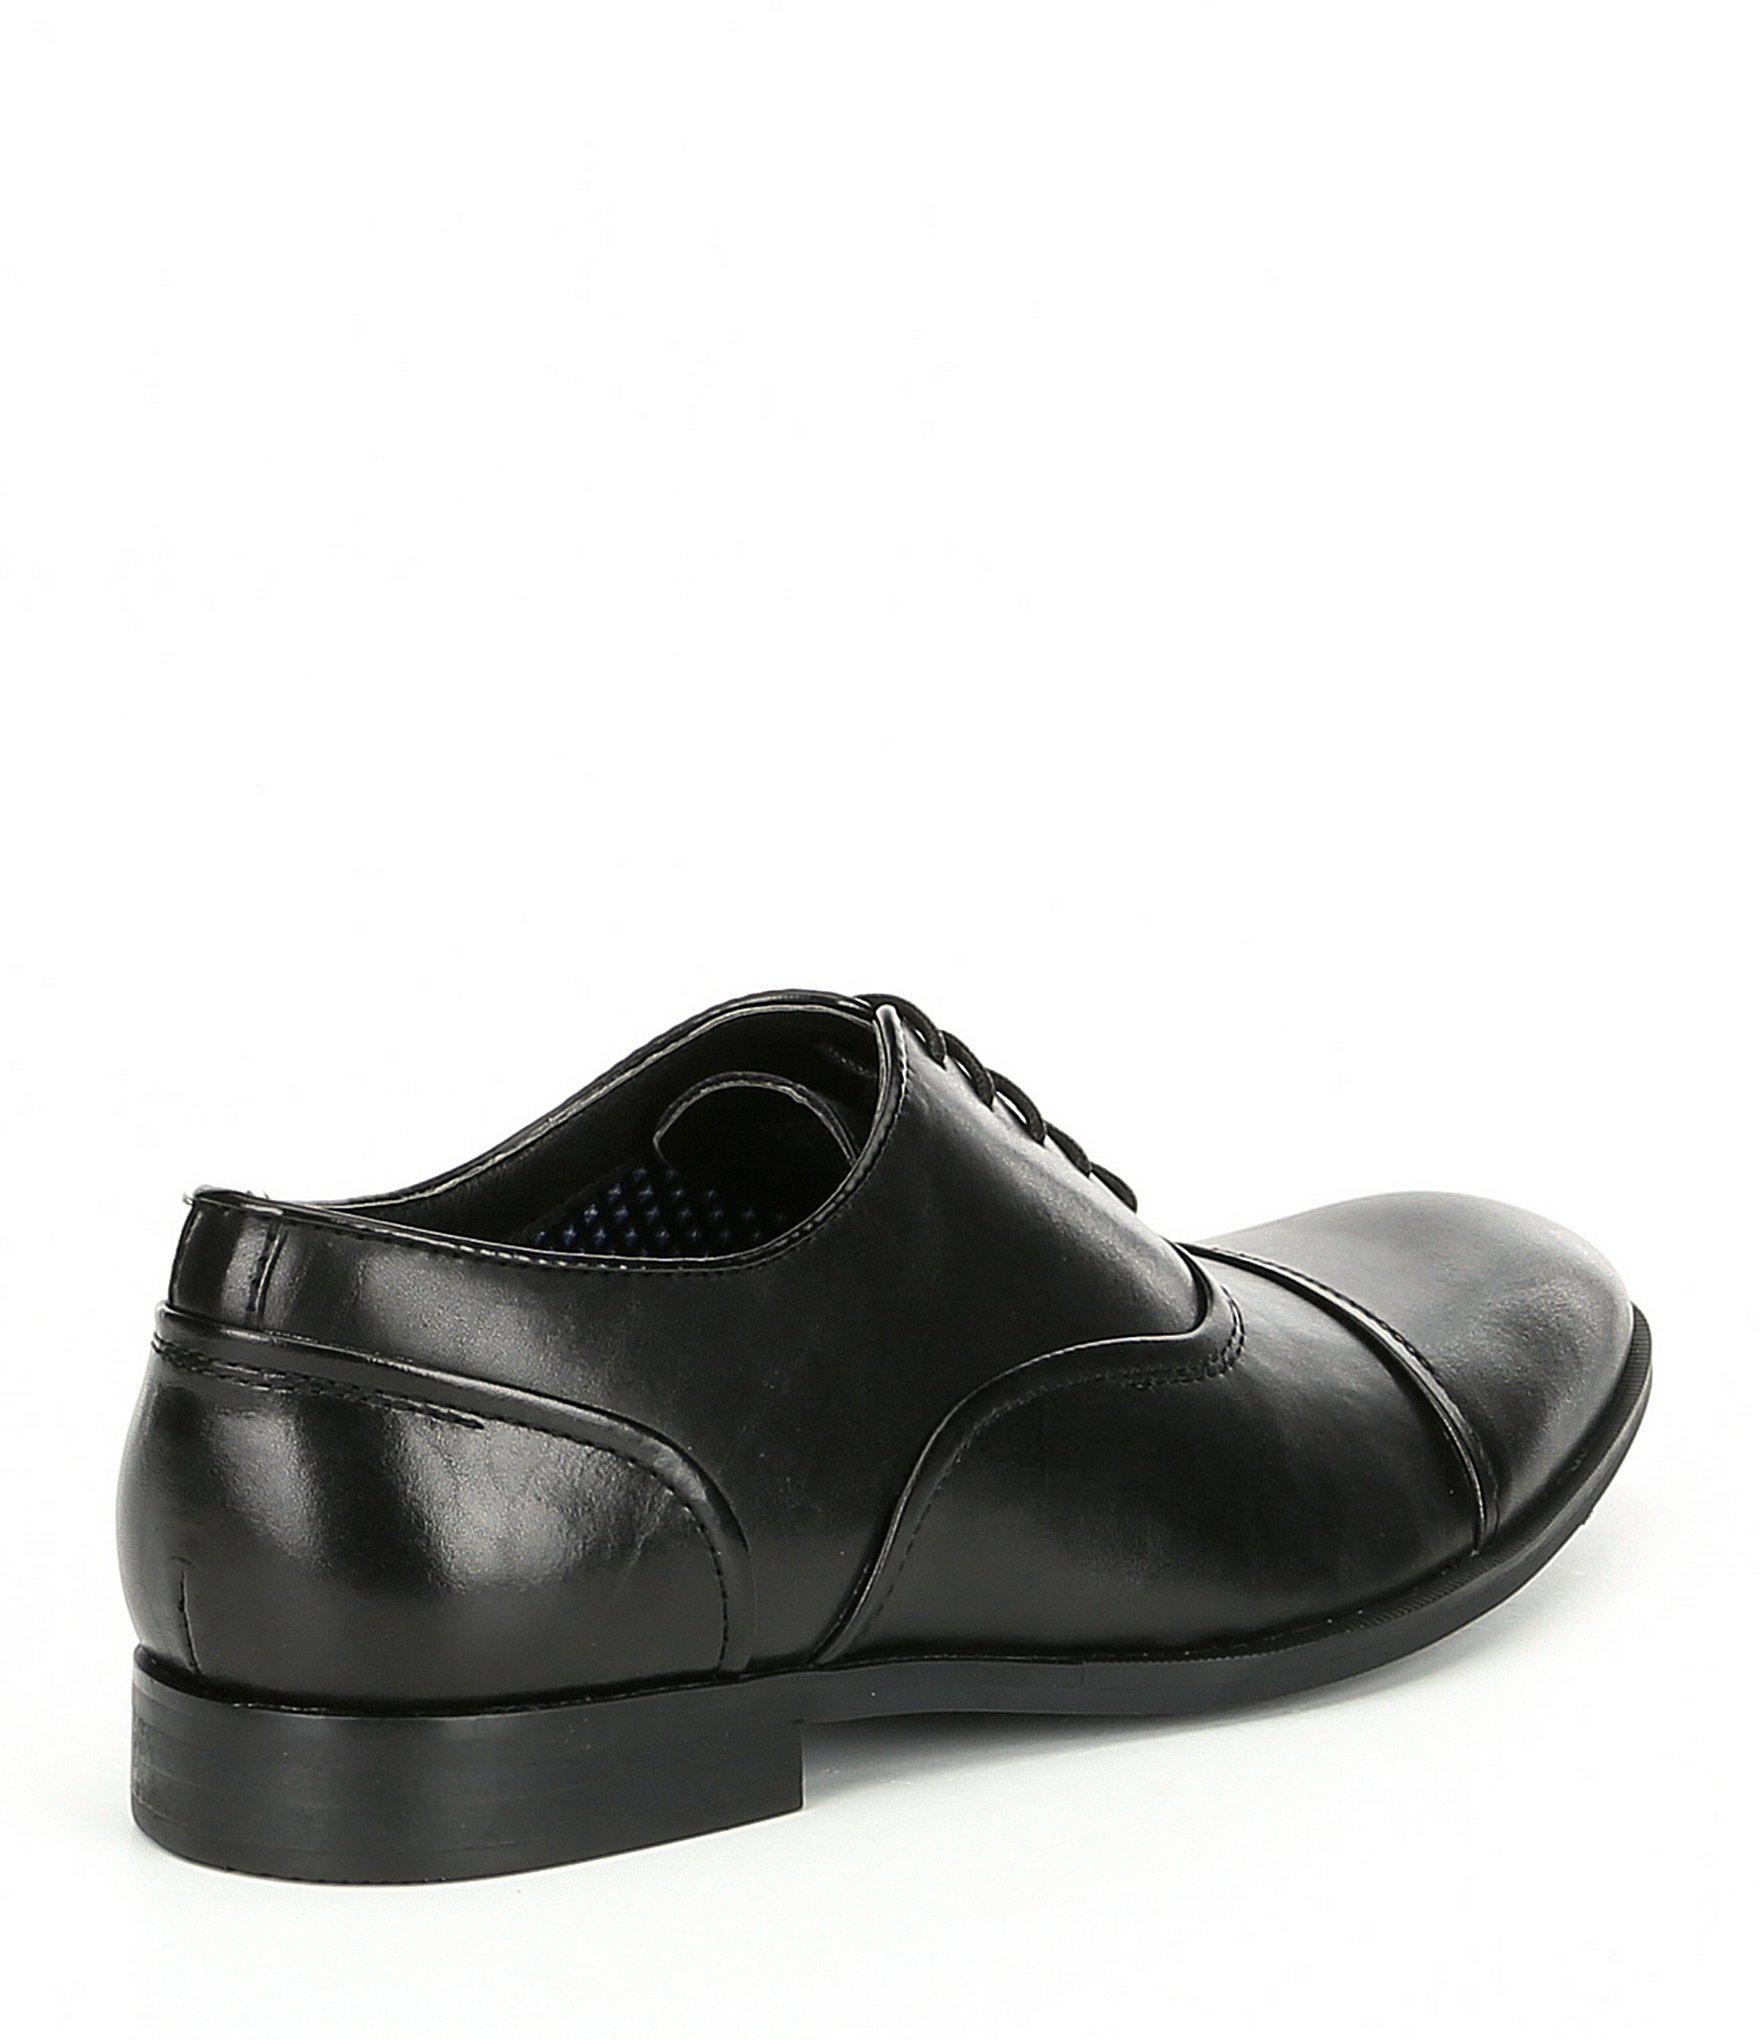 eee72bd2f4f Black Men's Elwood Leather Cap Toe Oxford